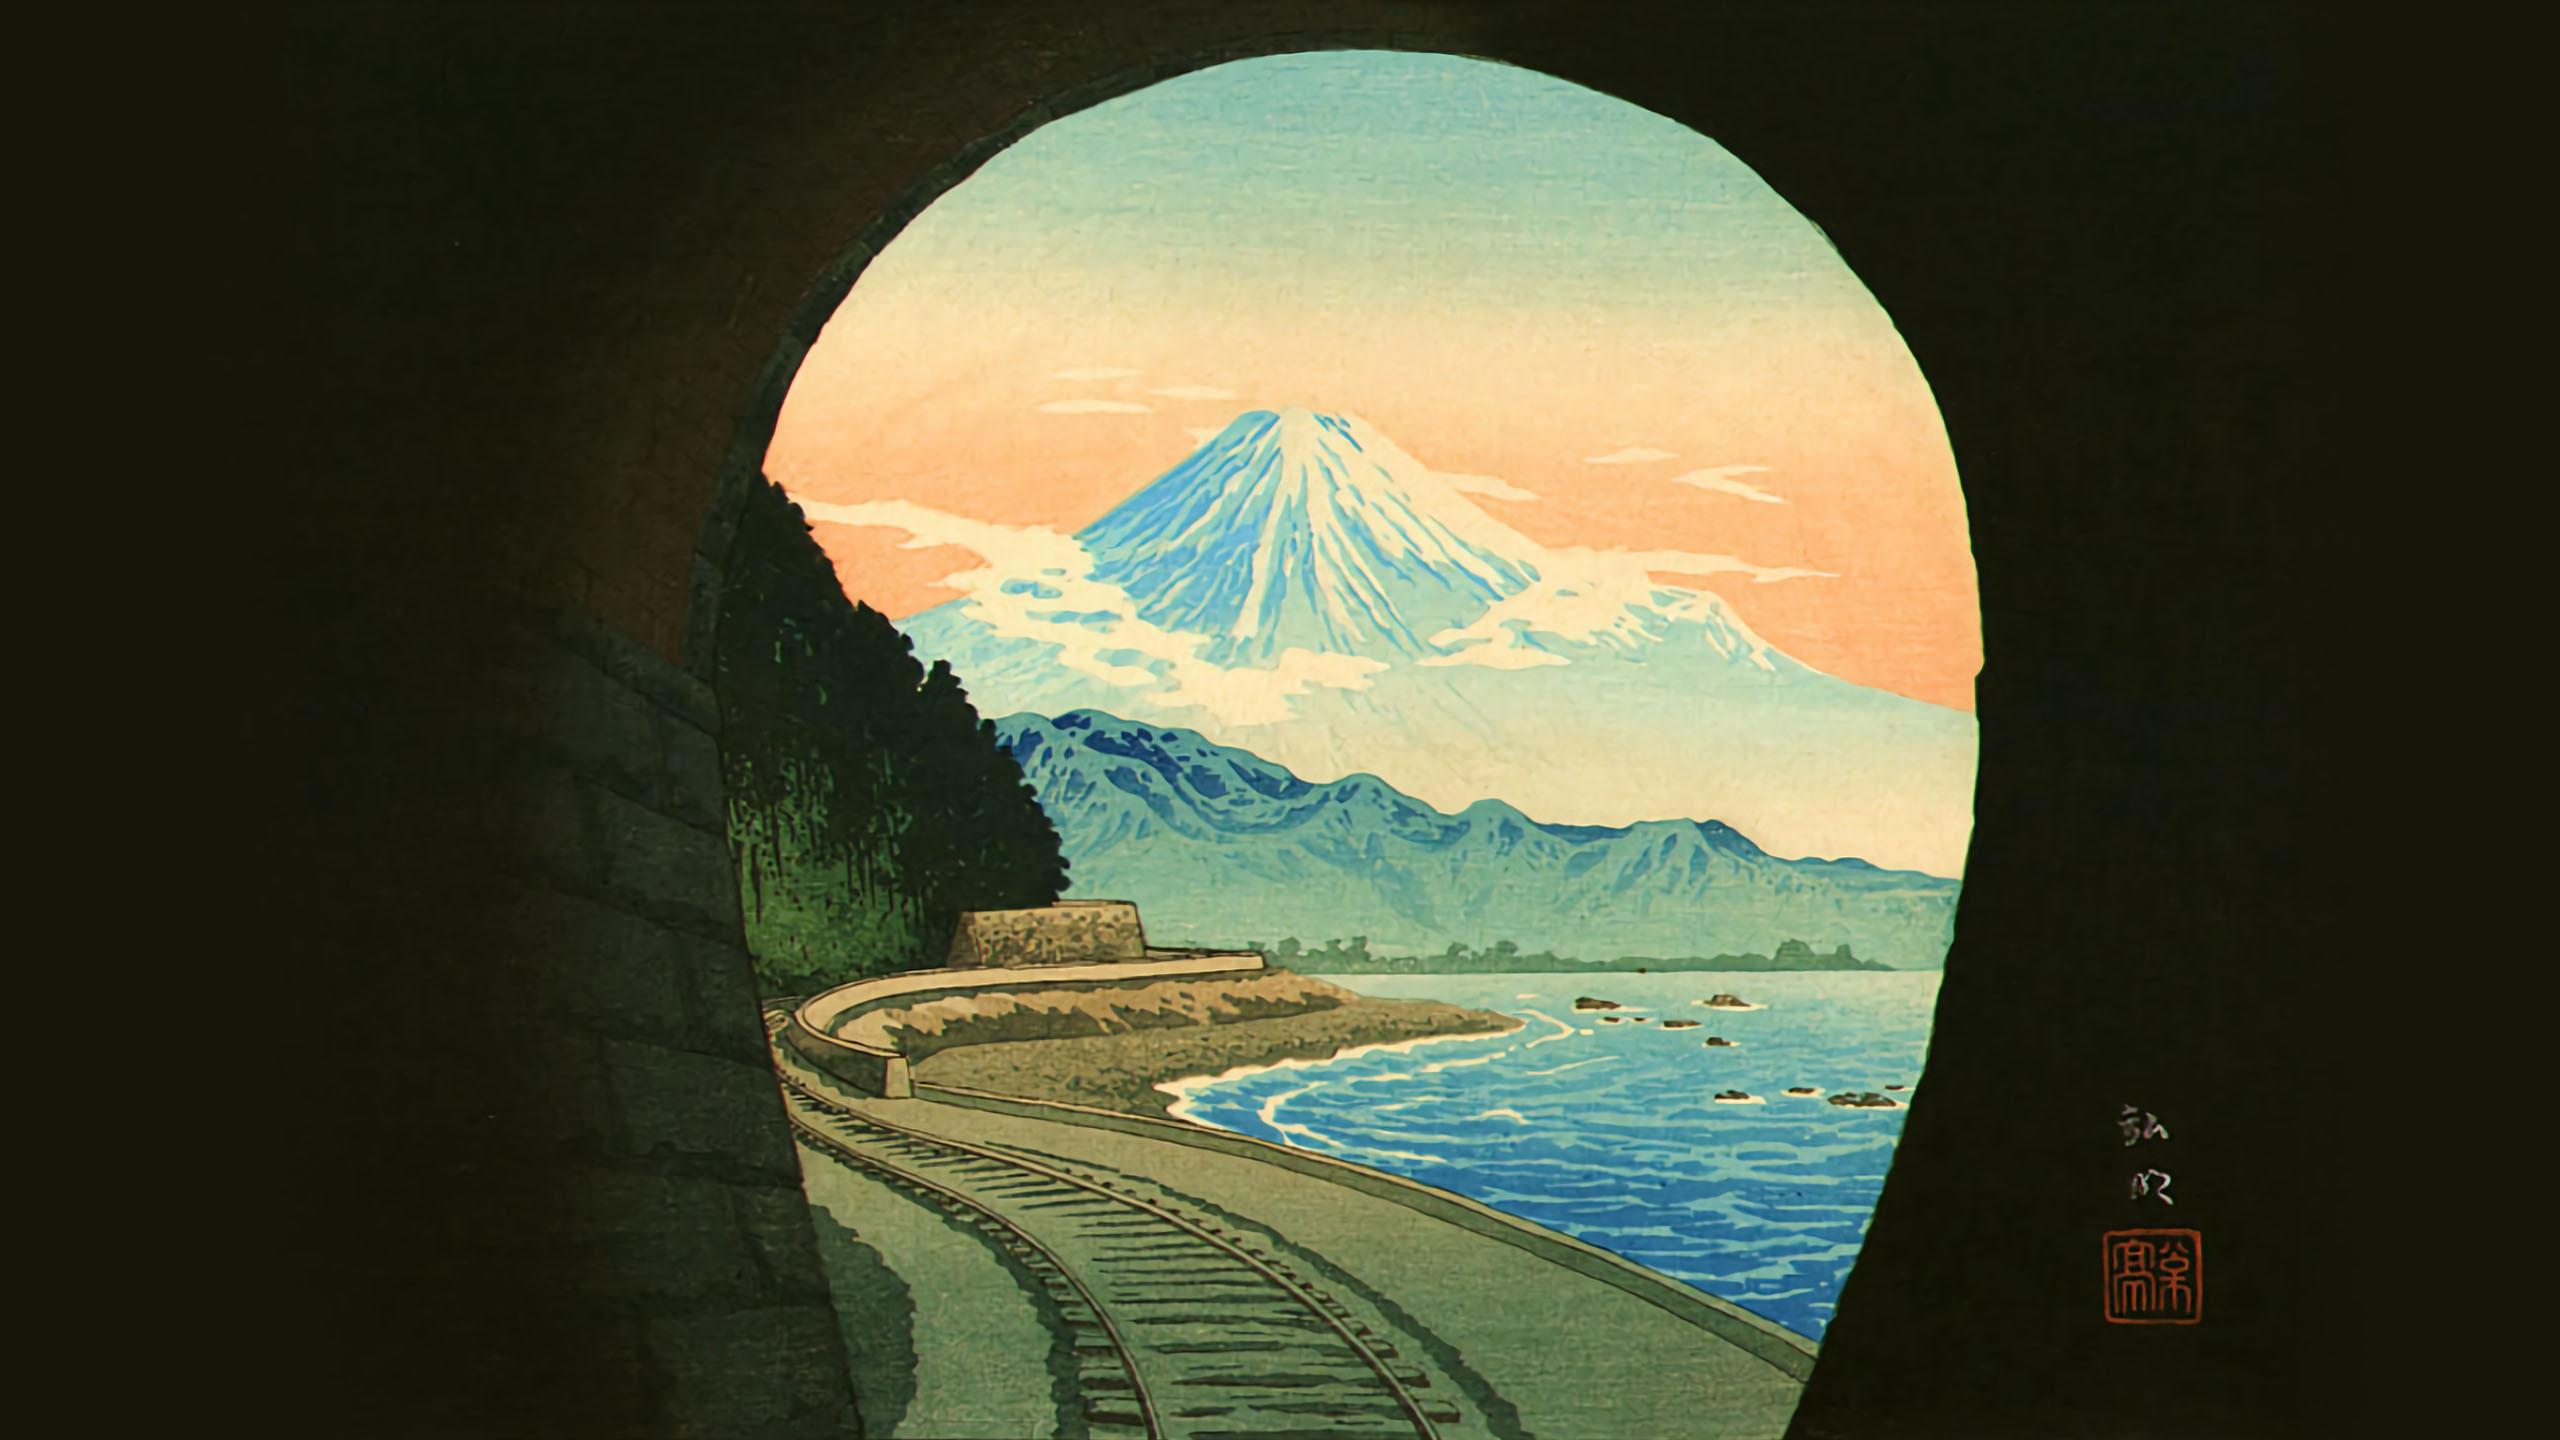 Takahashi Shotei - Sattatouge tunnel 2560x1440